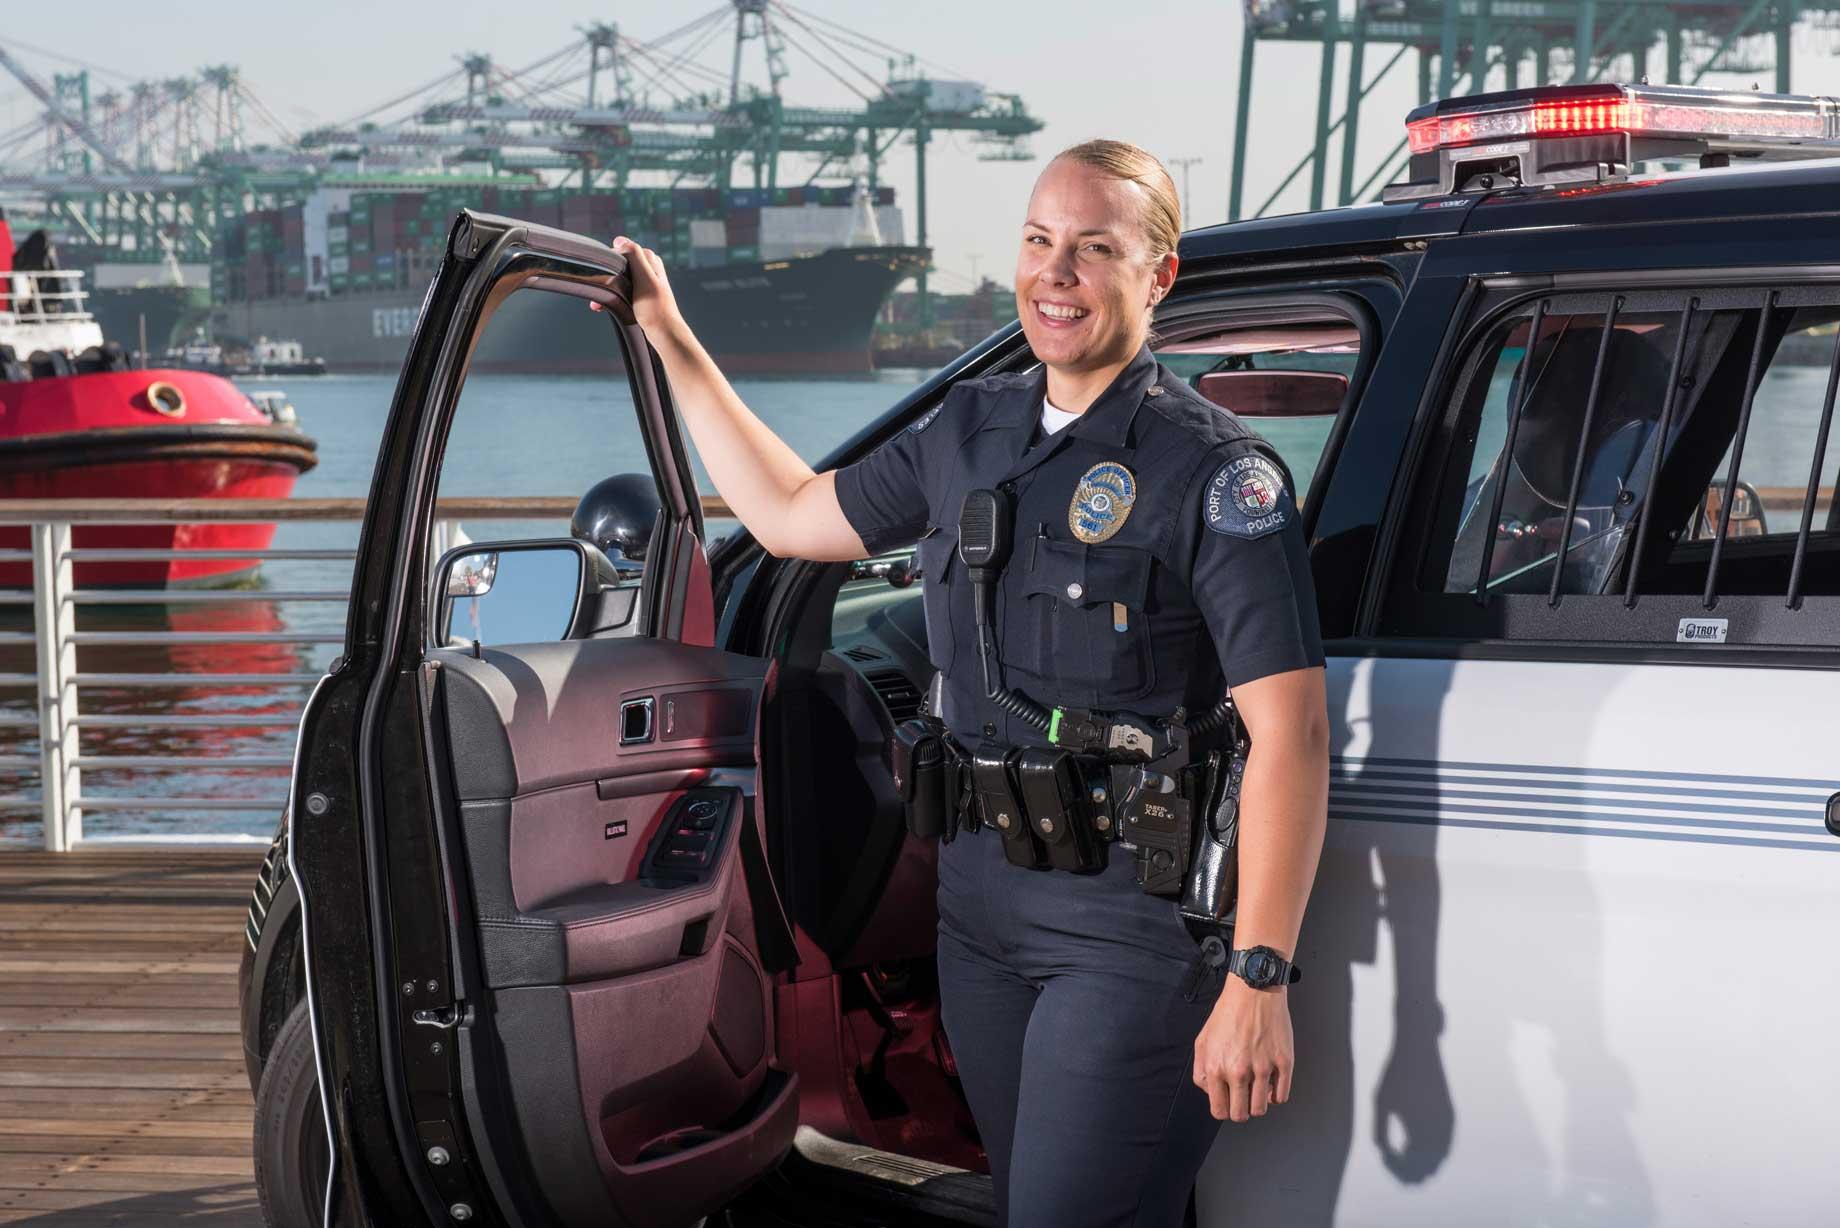 Port Police on patrol